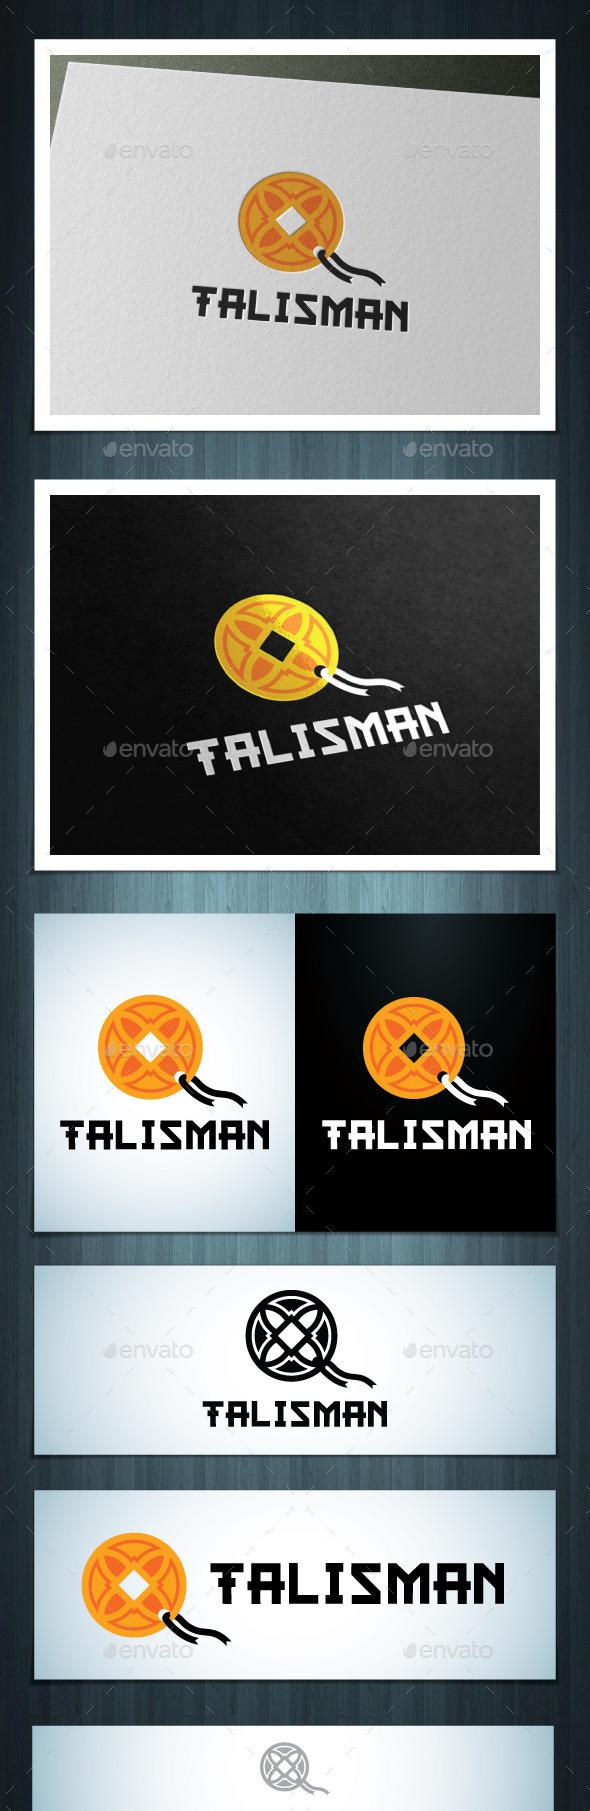 Talisman - Vector Abstract